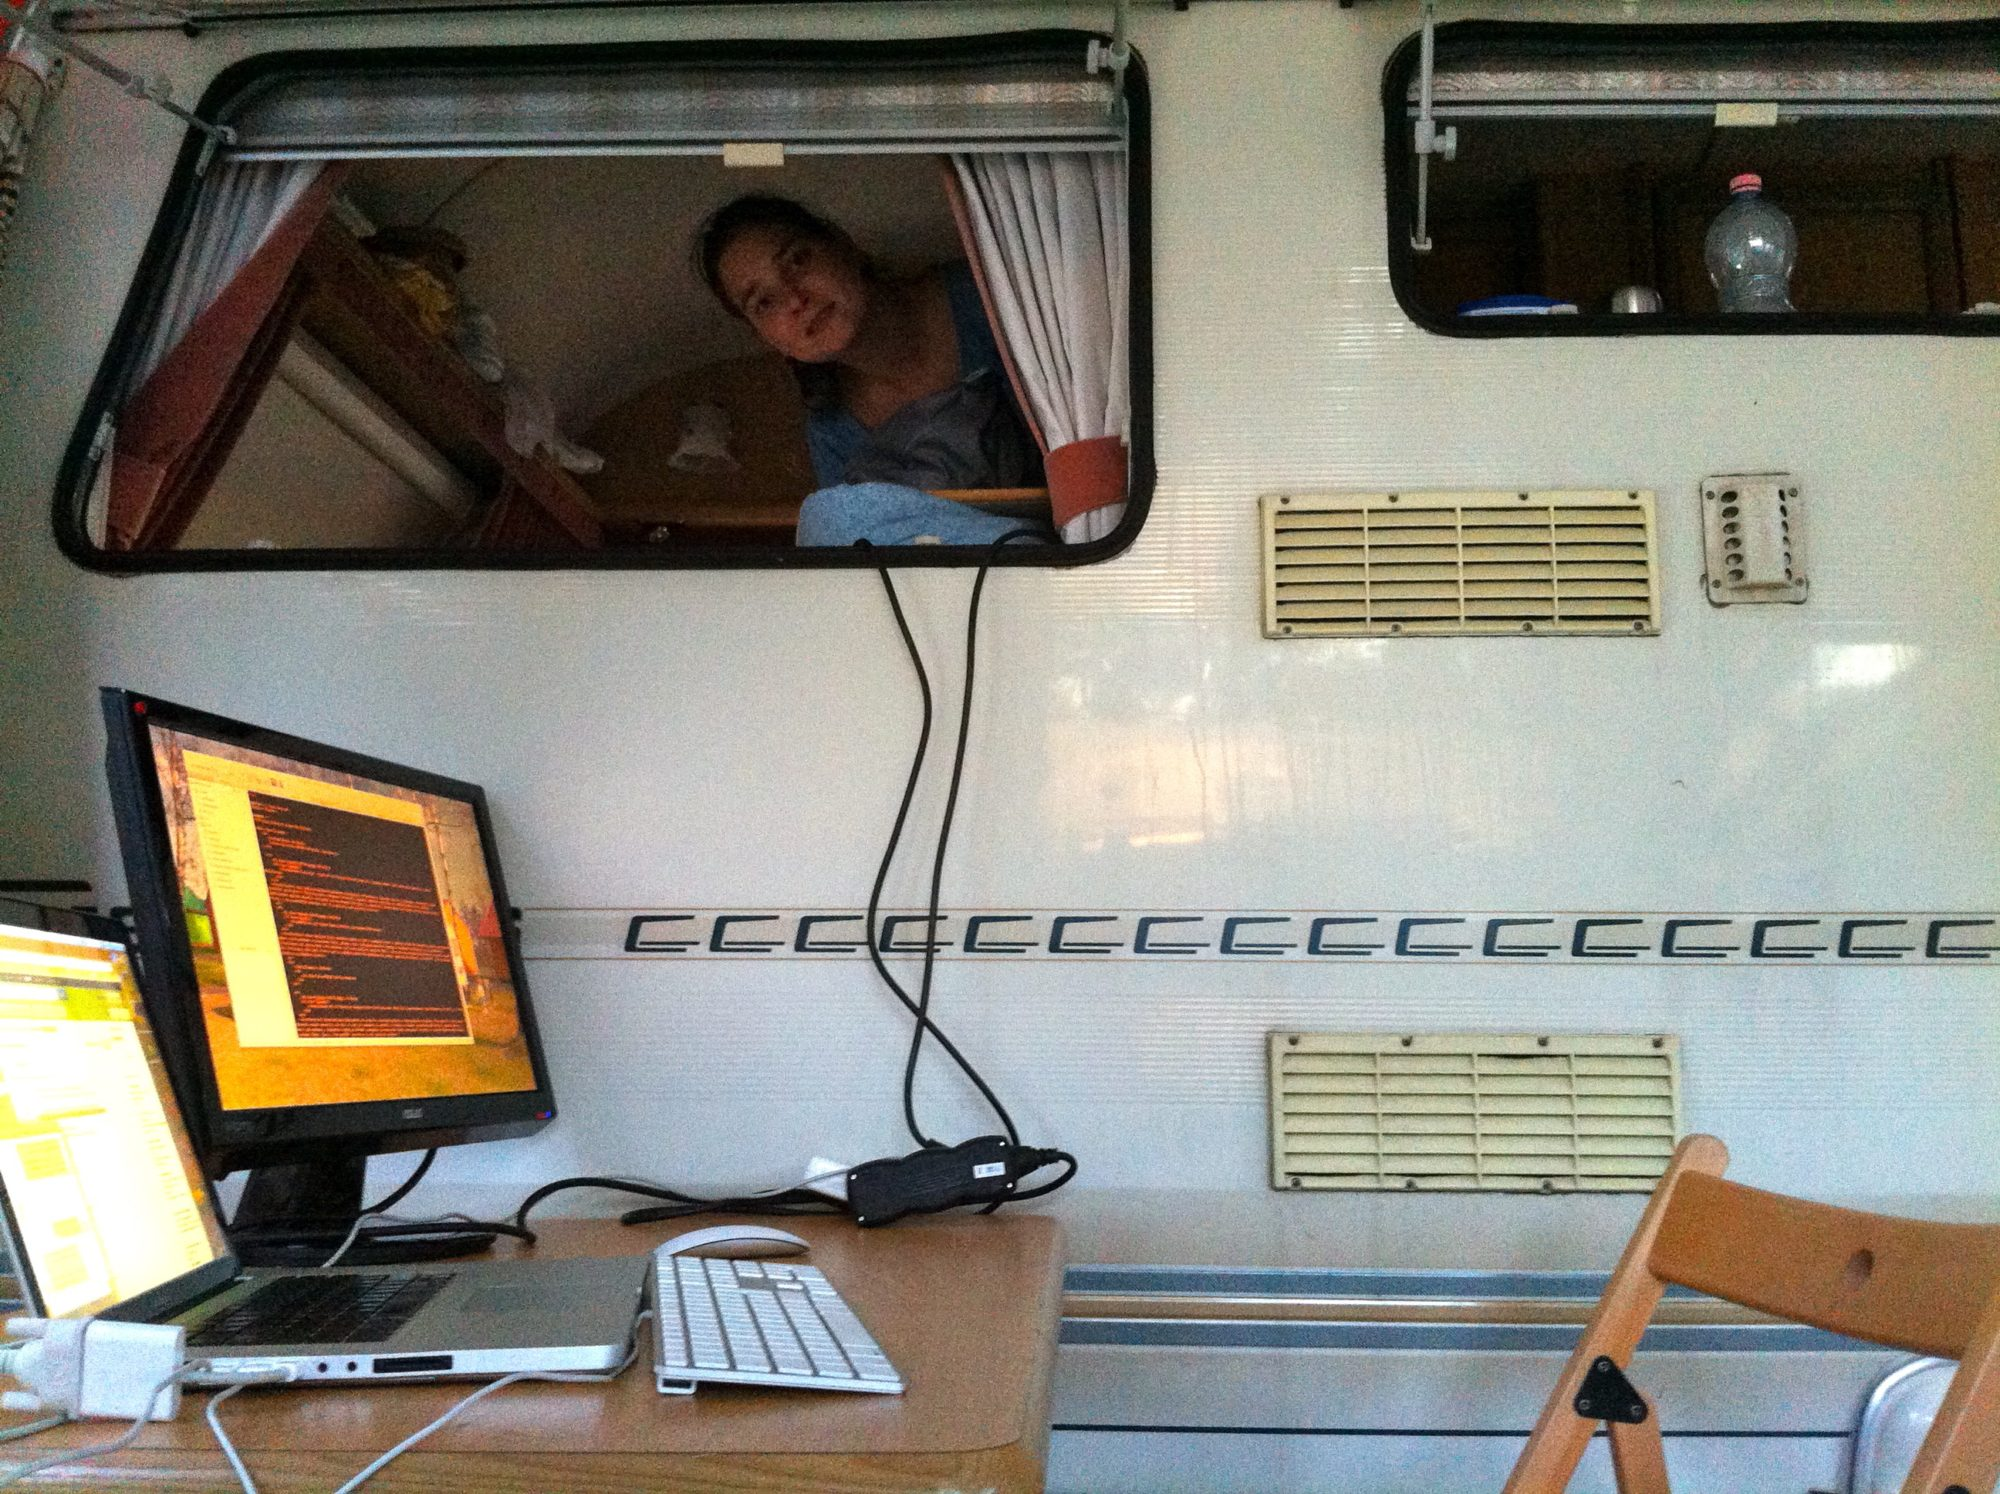 Workstation in the Caravan